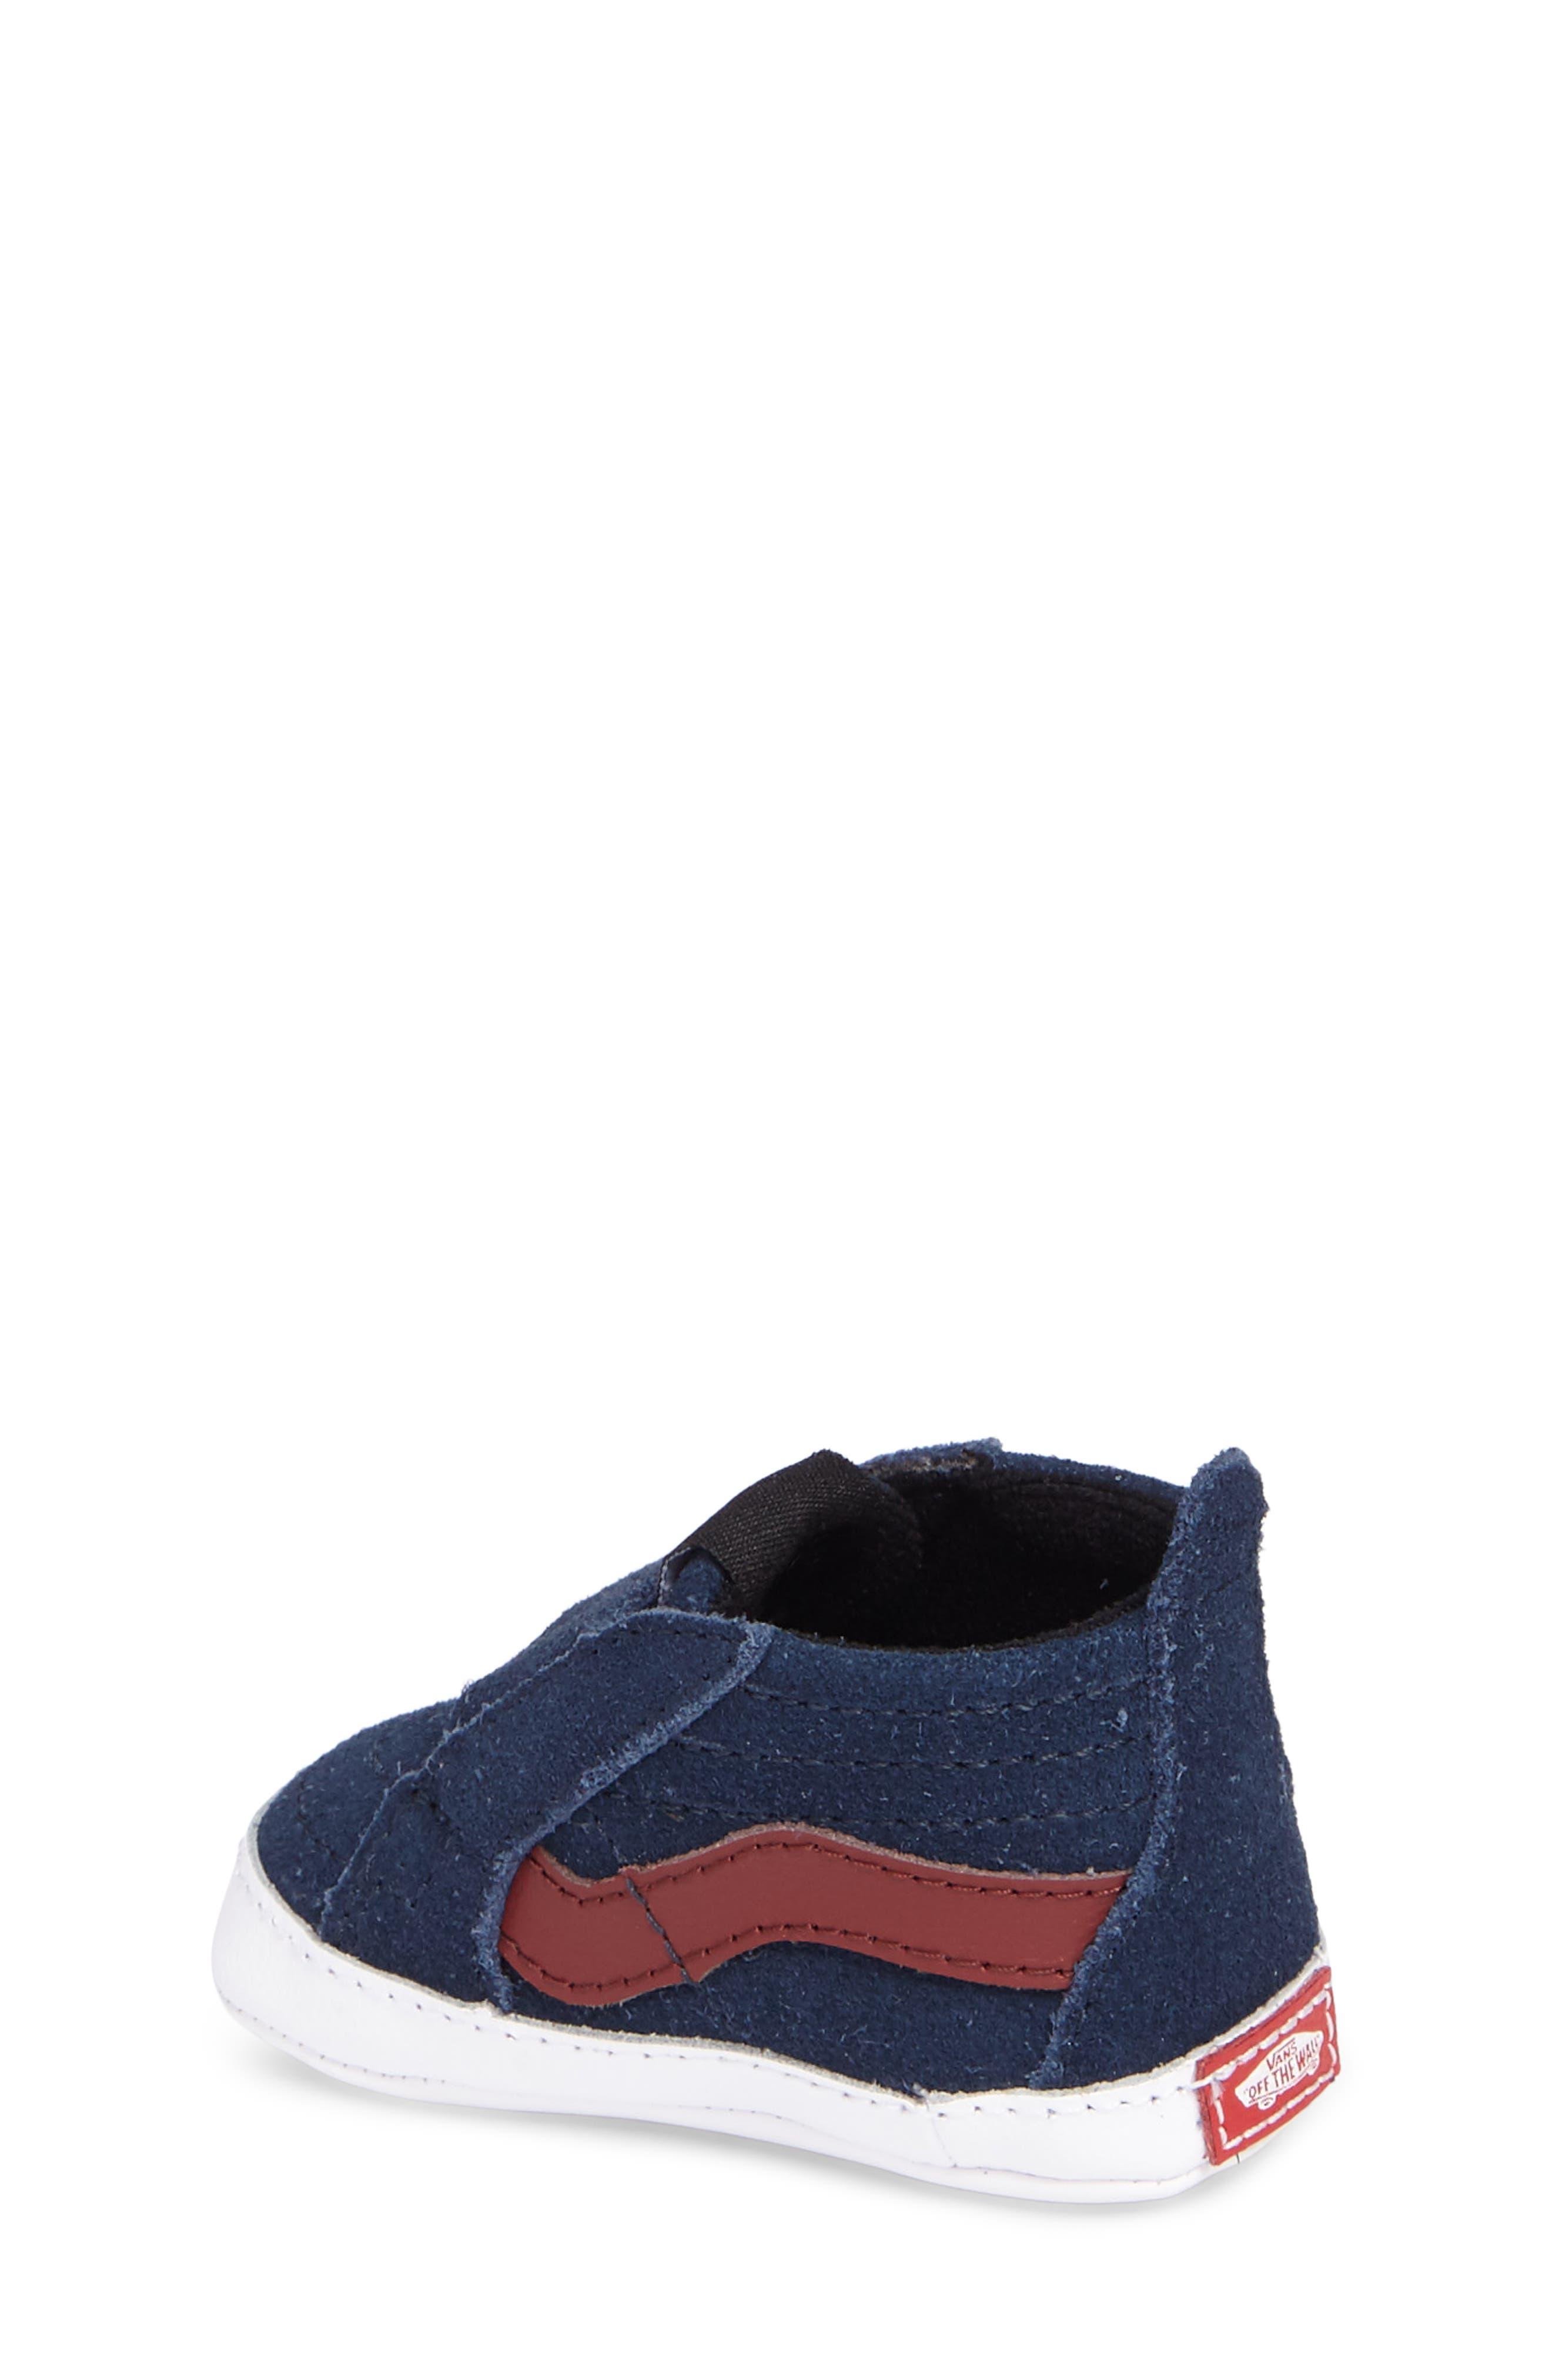 SK8-Hi Crib Sneaker,                             Alternate thumbnail 2, color,                             401